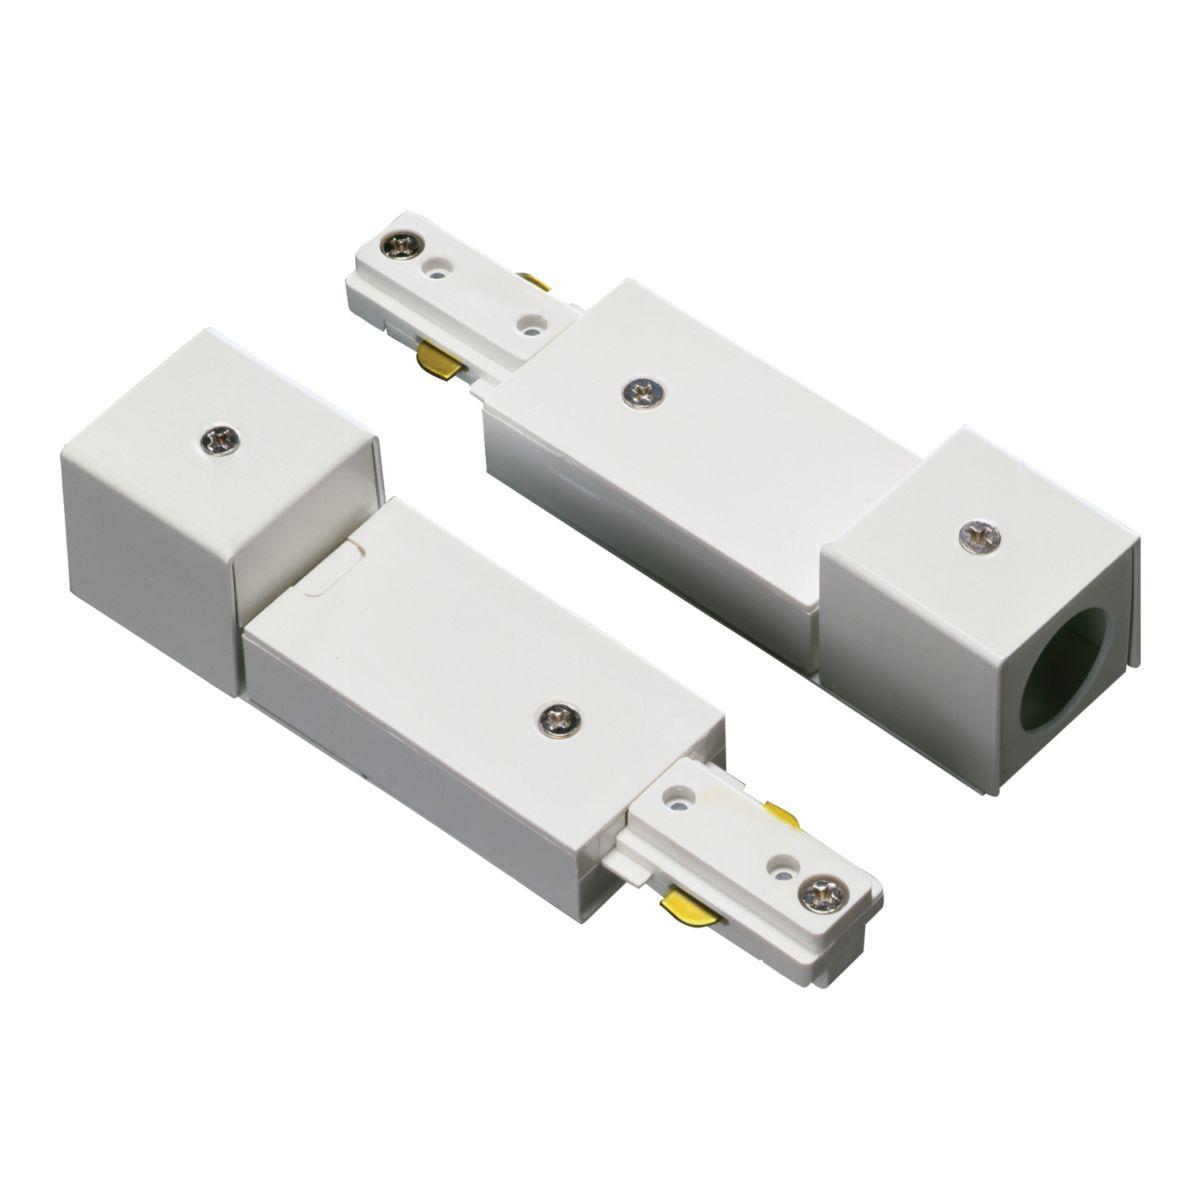 L979 Single Circuit Conduit Continuation Kit